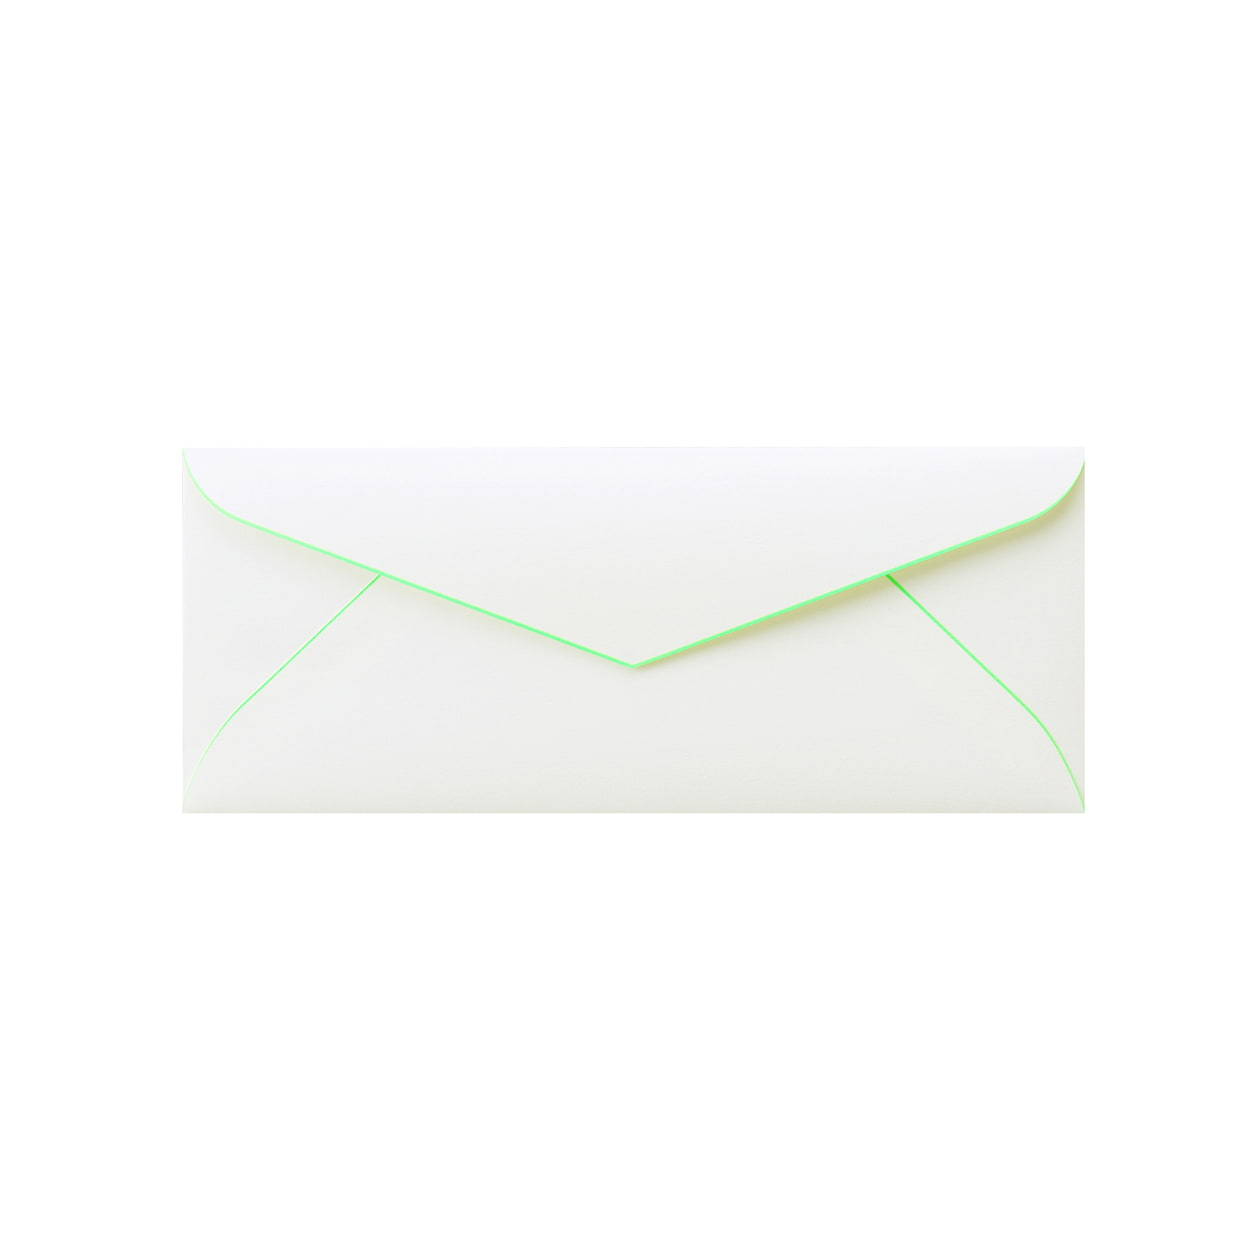 DLSダイア封筒 コットン スノーホワイトBD蛍光グリーン 116.3g